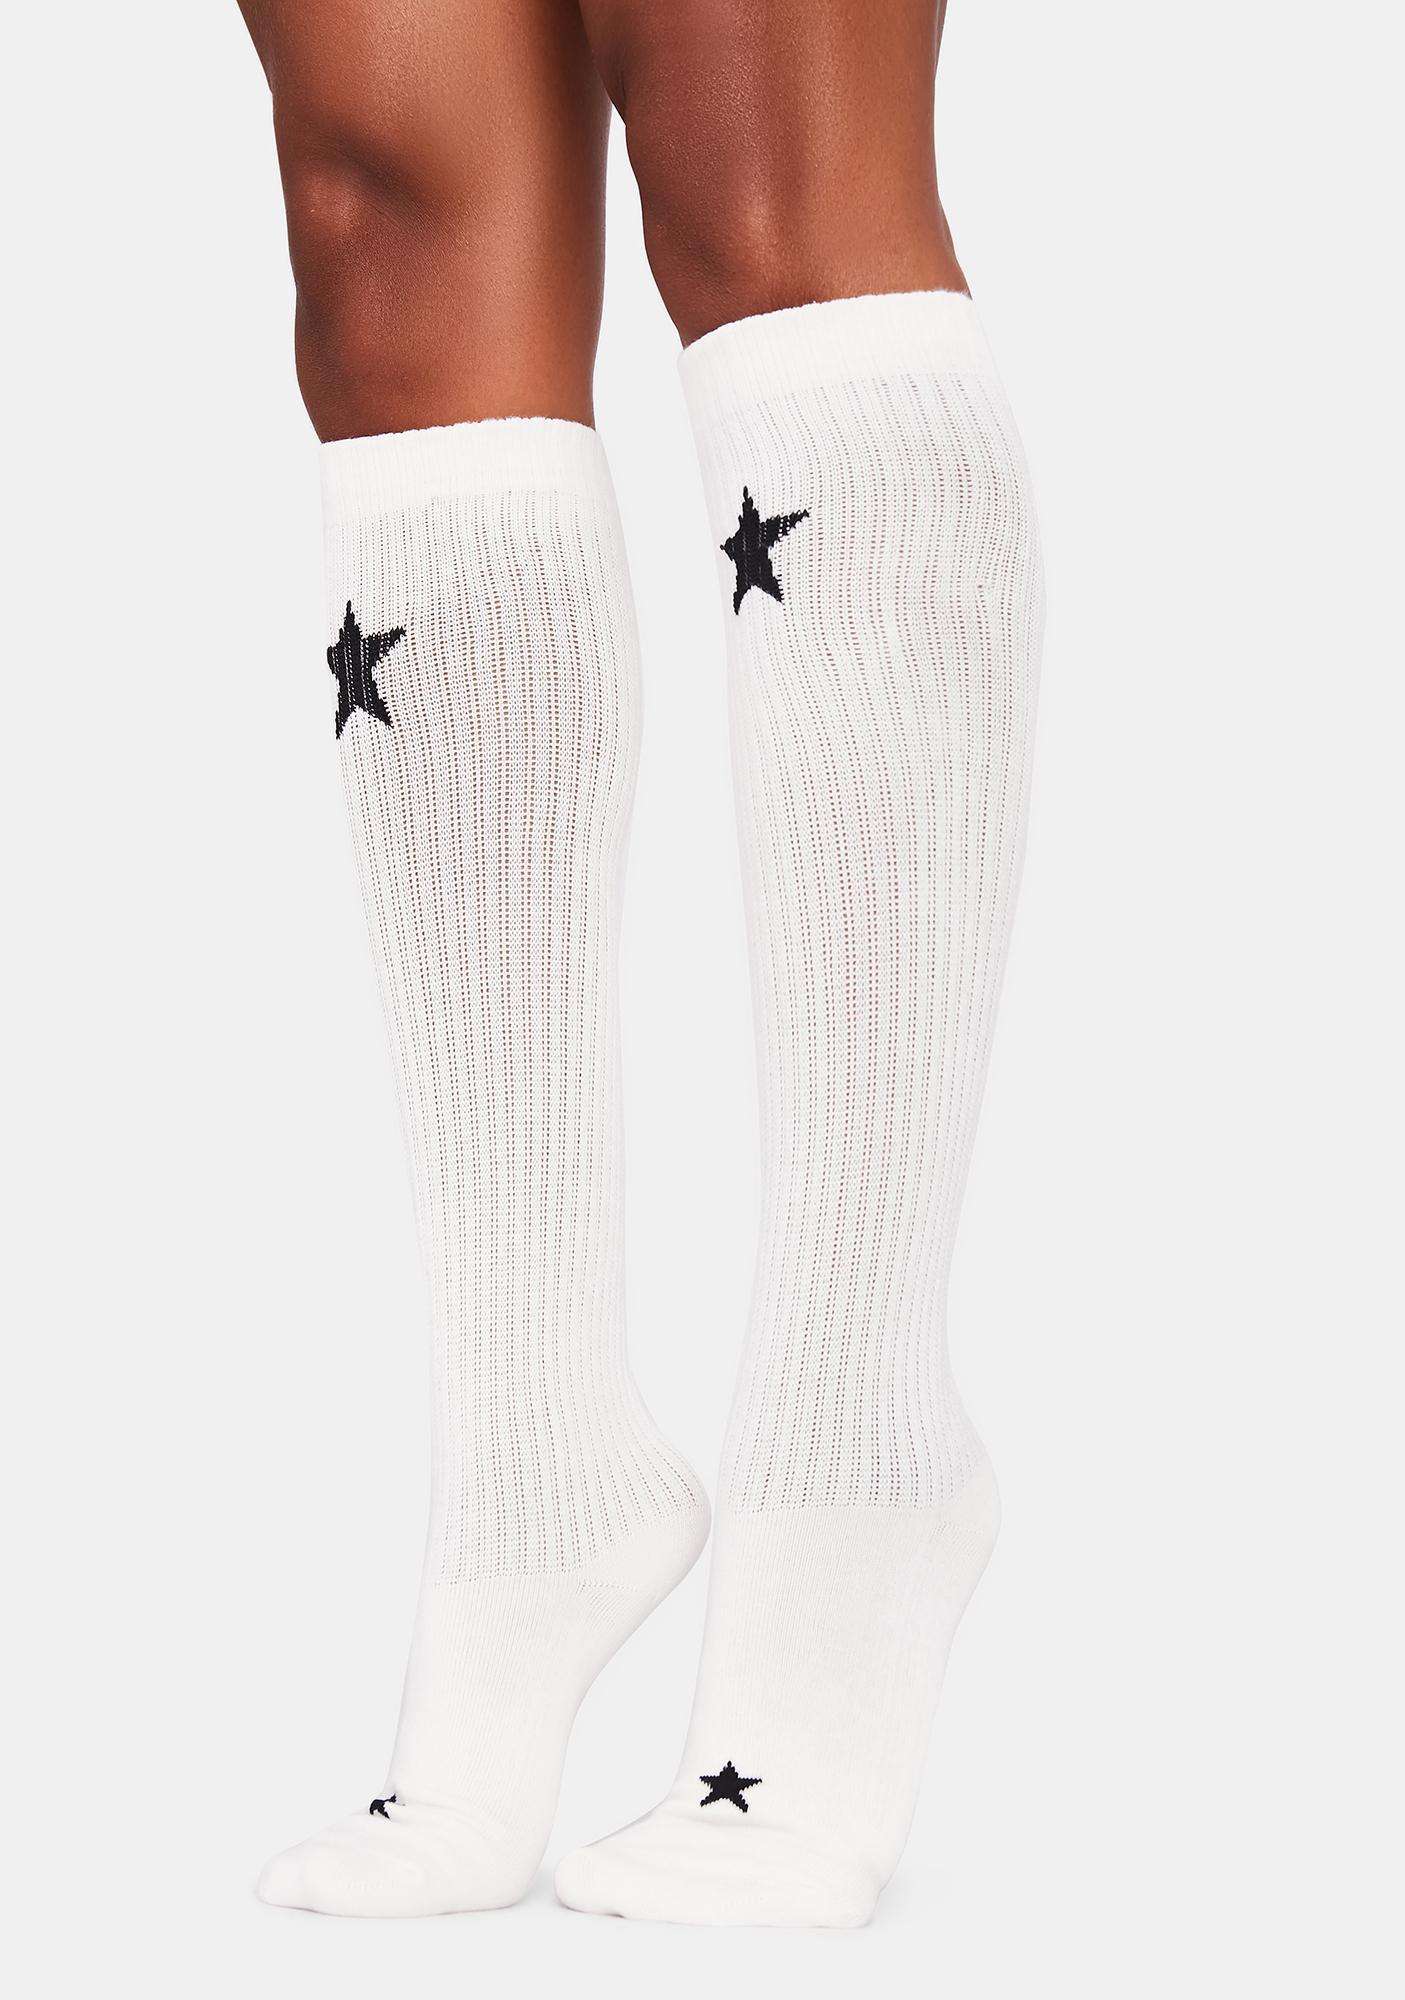 Angel Infinite Wishes Knee High Socks